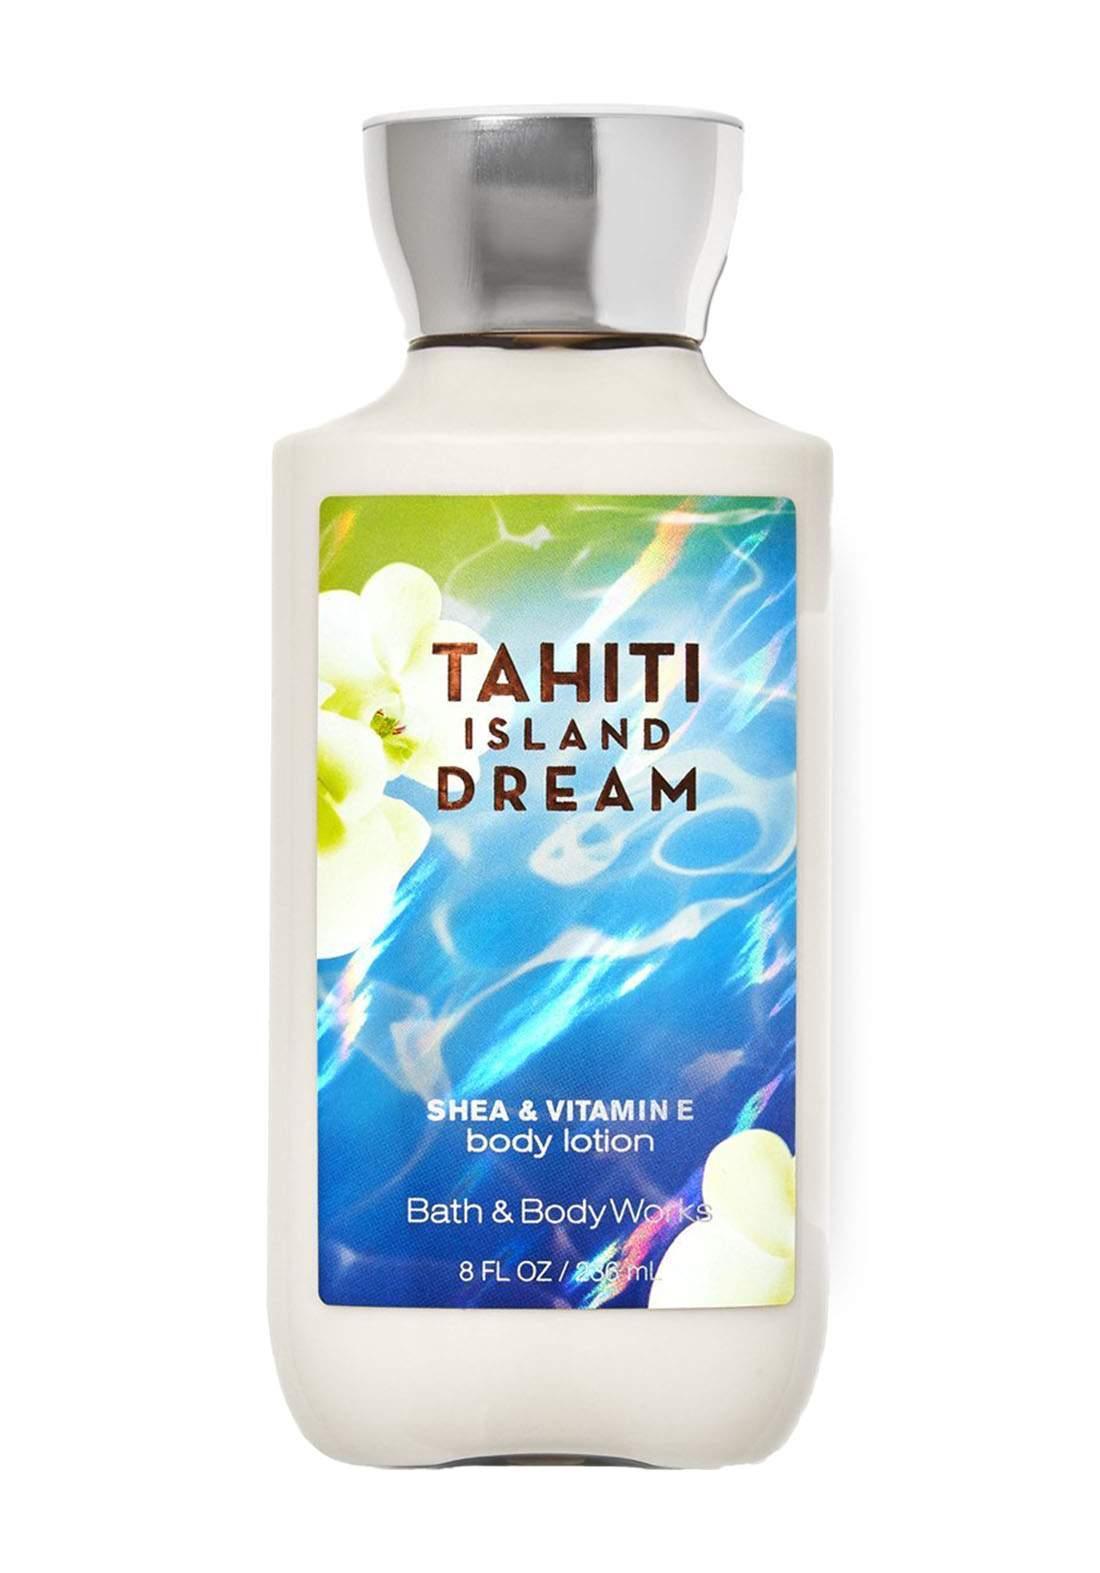 Bath and Body Works Tahiti Island Dream Body Lotion 236ml لوشن الجسم